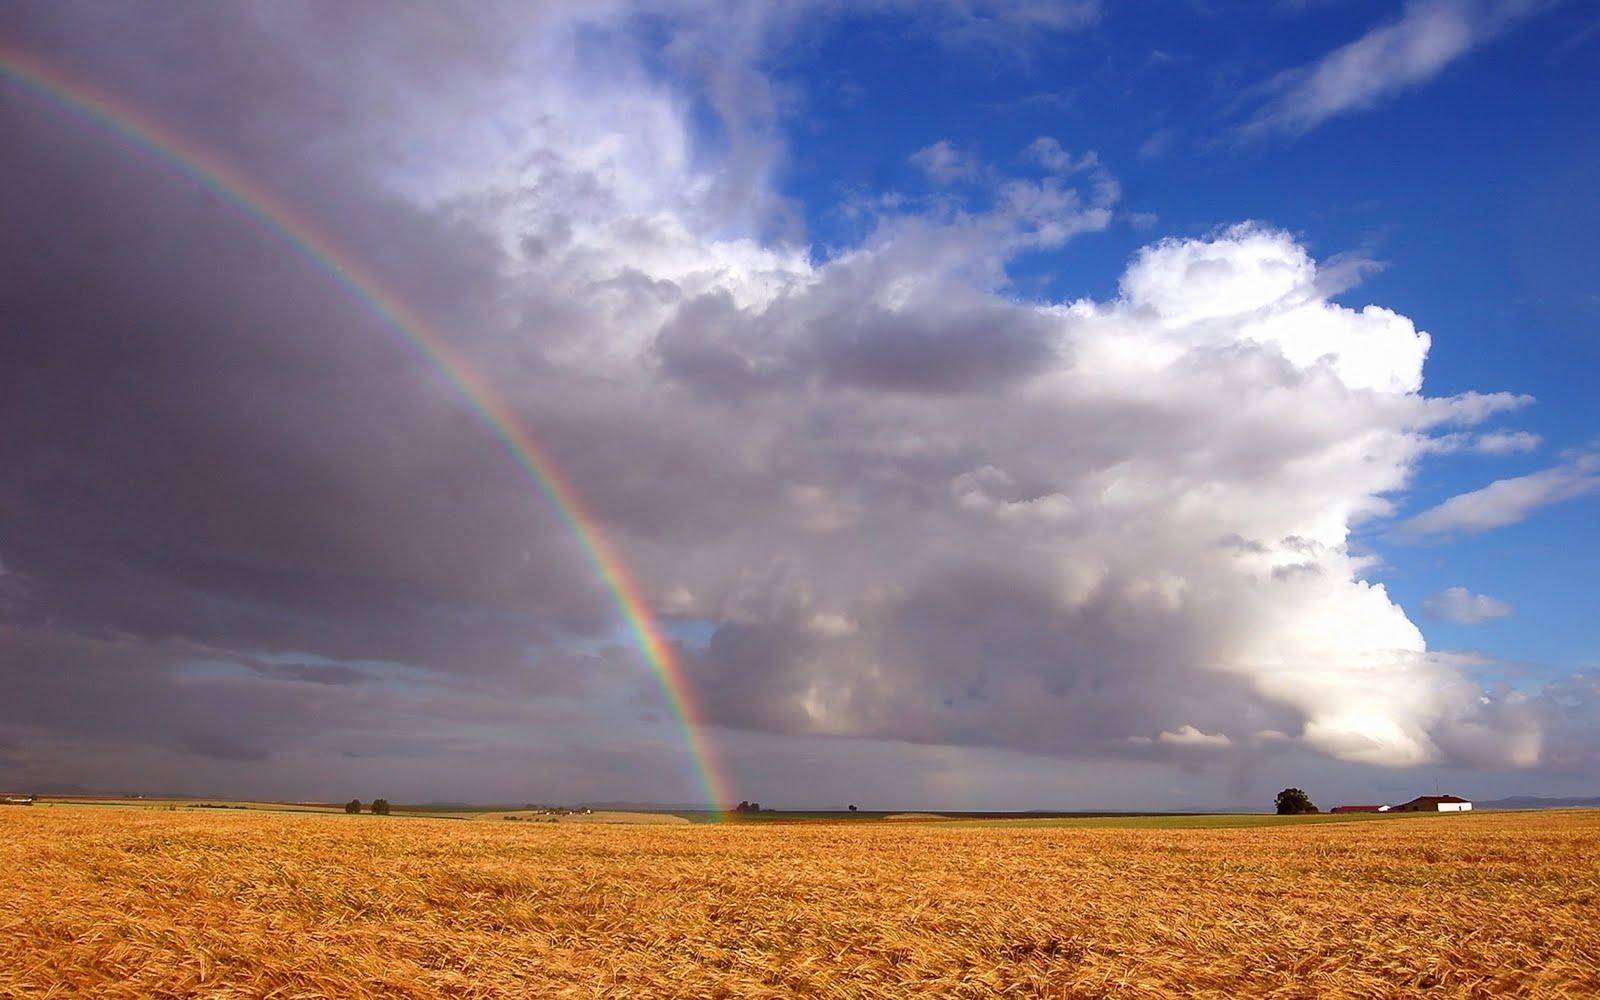 https://1.bp.blogspot.com/_2IU2Nt4rD1k/TDorD2cFxRI/AAAAAAAAB3M/t2THtAPVs1k/s1600/rainbow_wallpaper.jpg